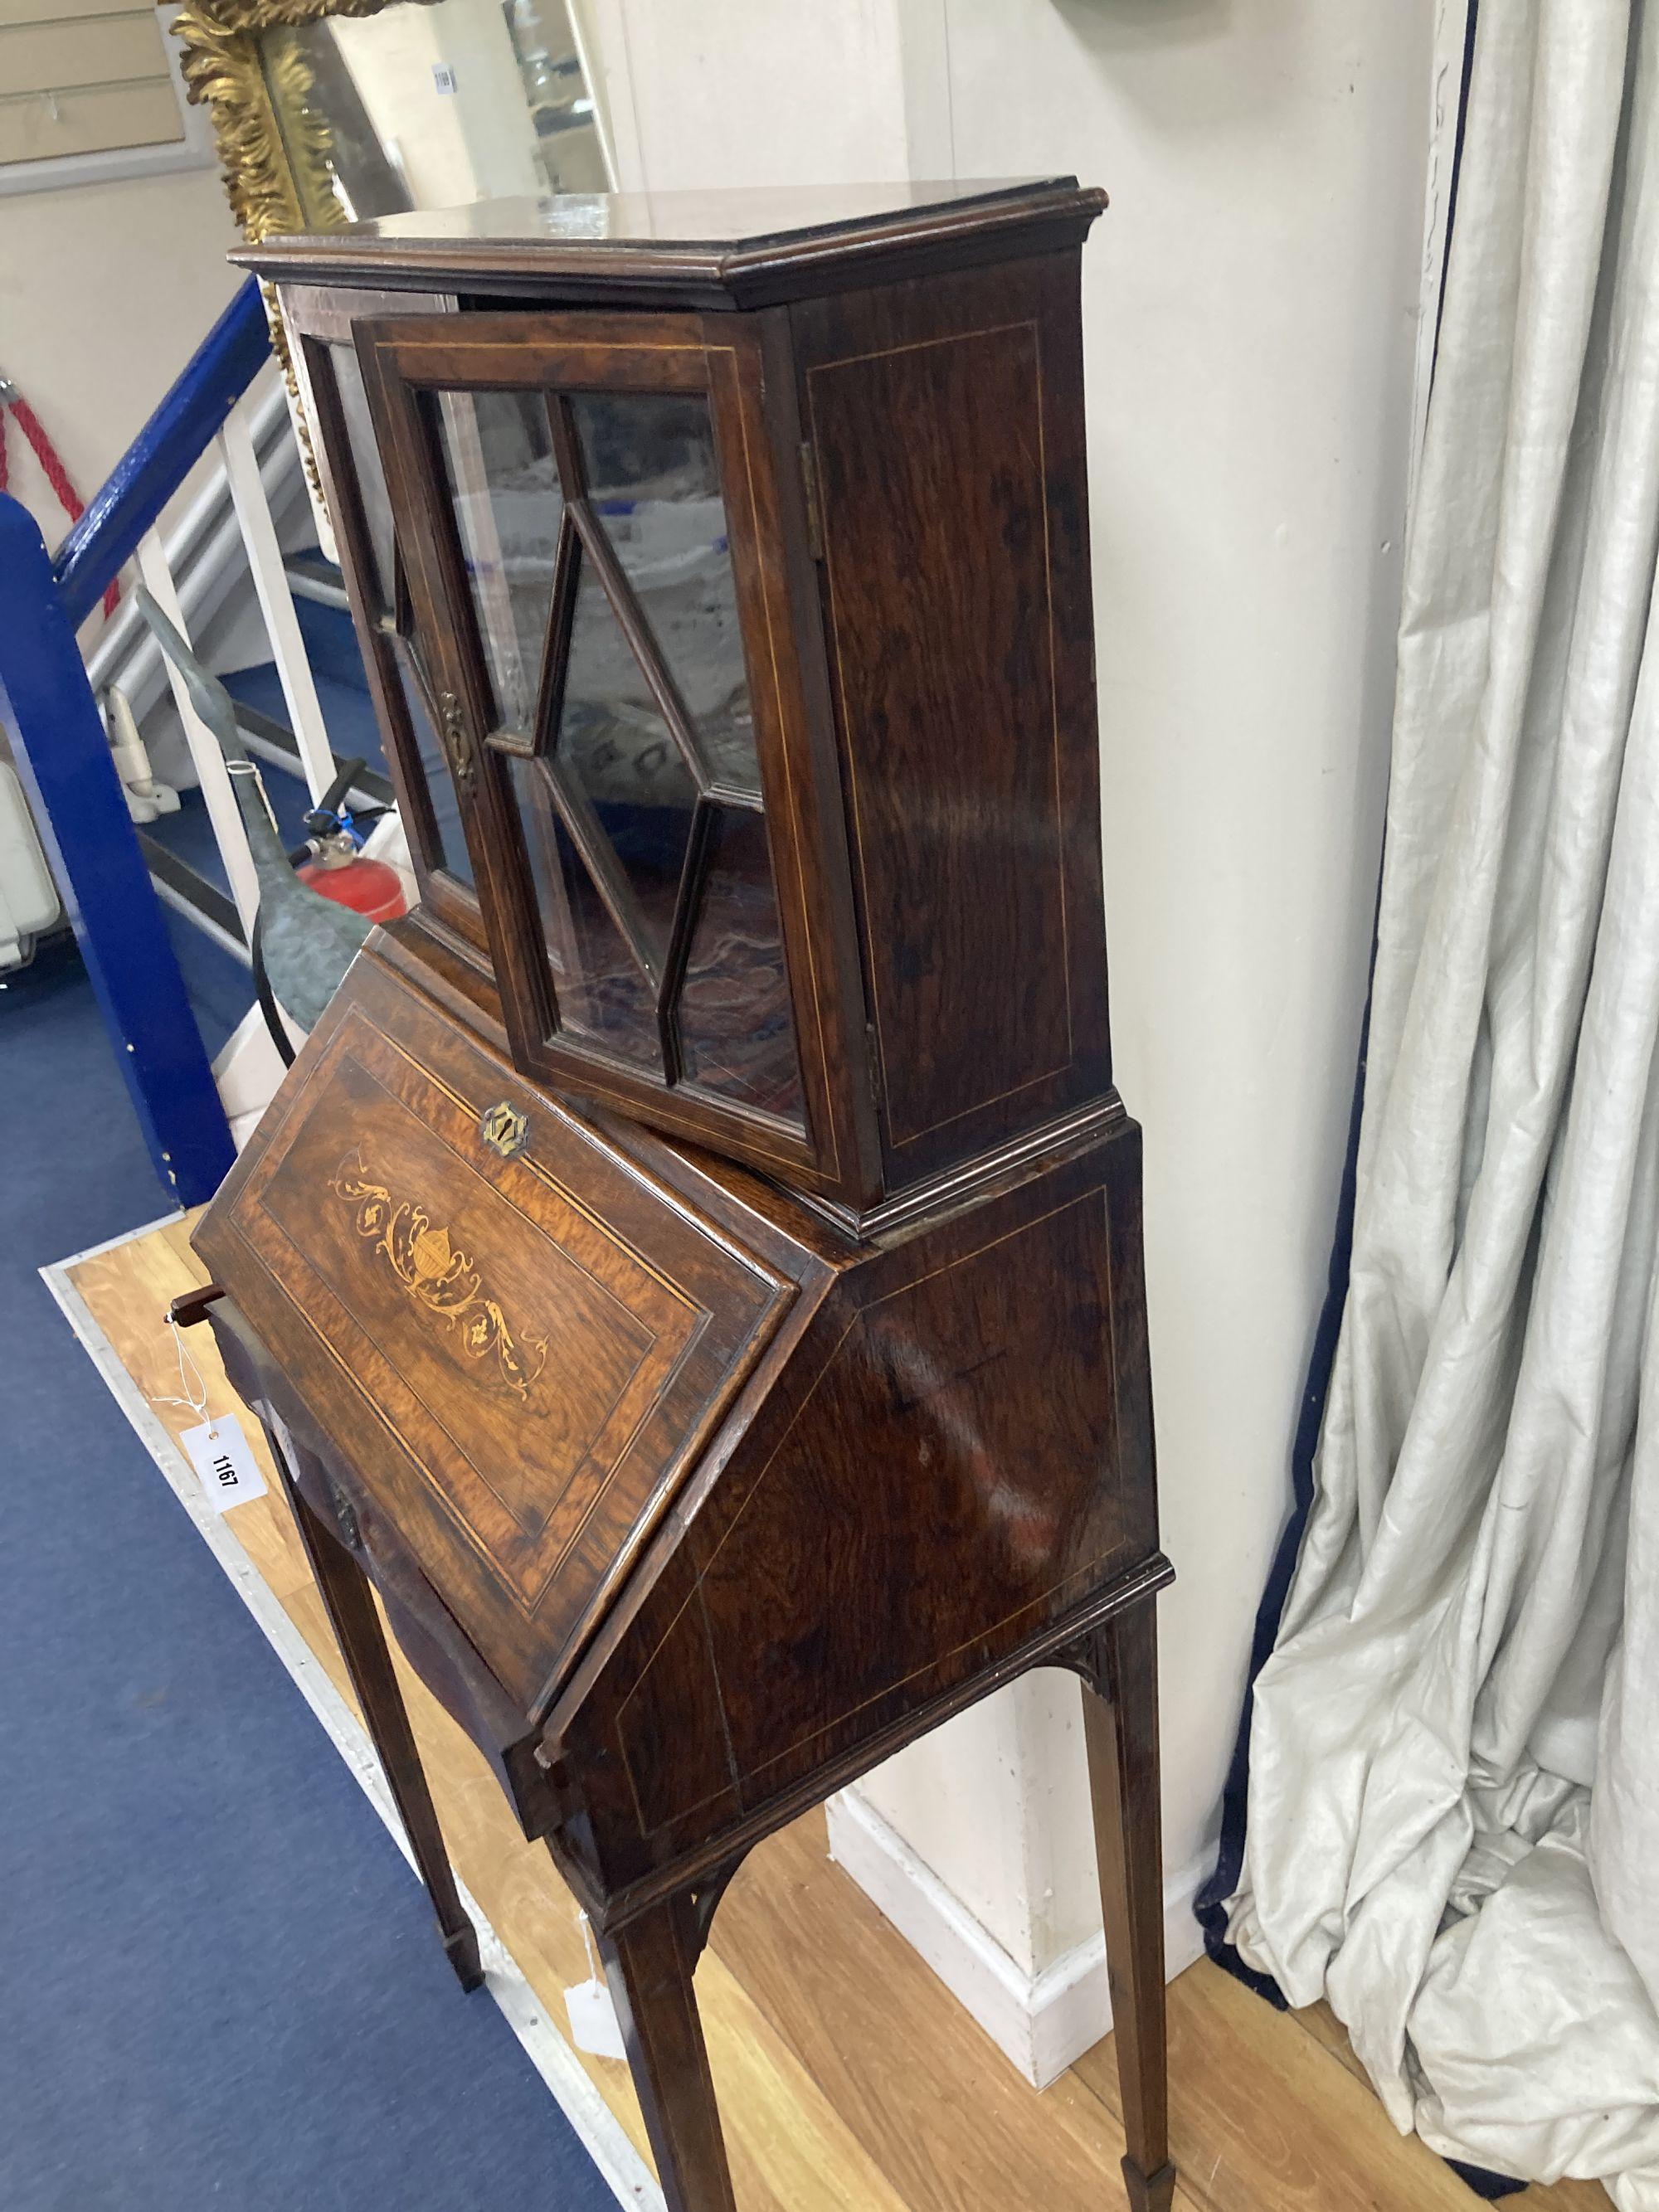 A late Victorian inlaid rosewood bonheur du jour, width 51cm, depth 34cm, height 129cm - Image 2 of 3